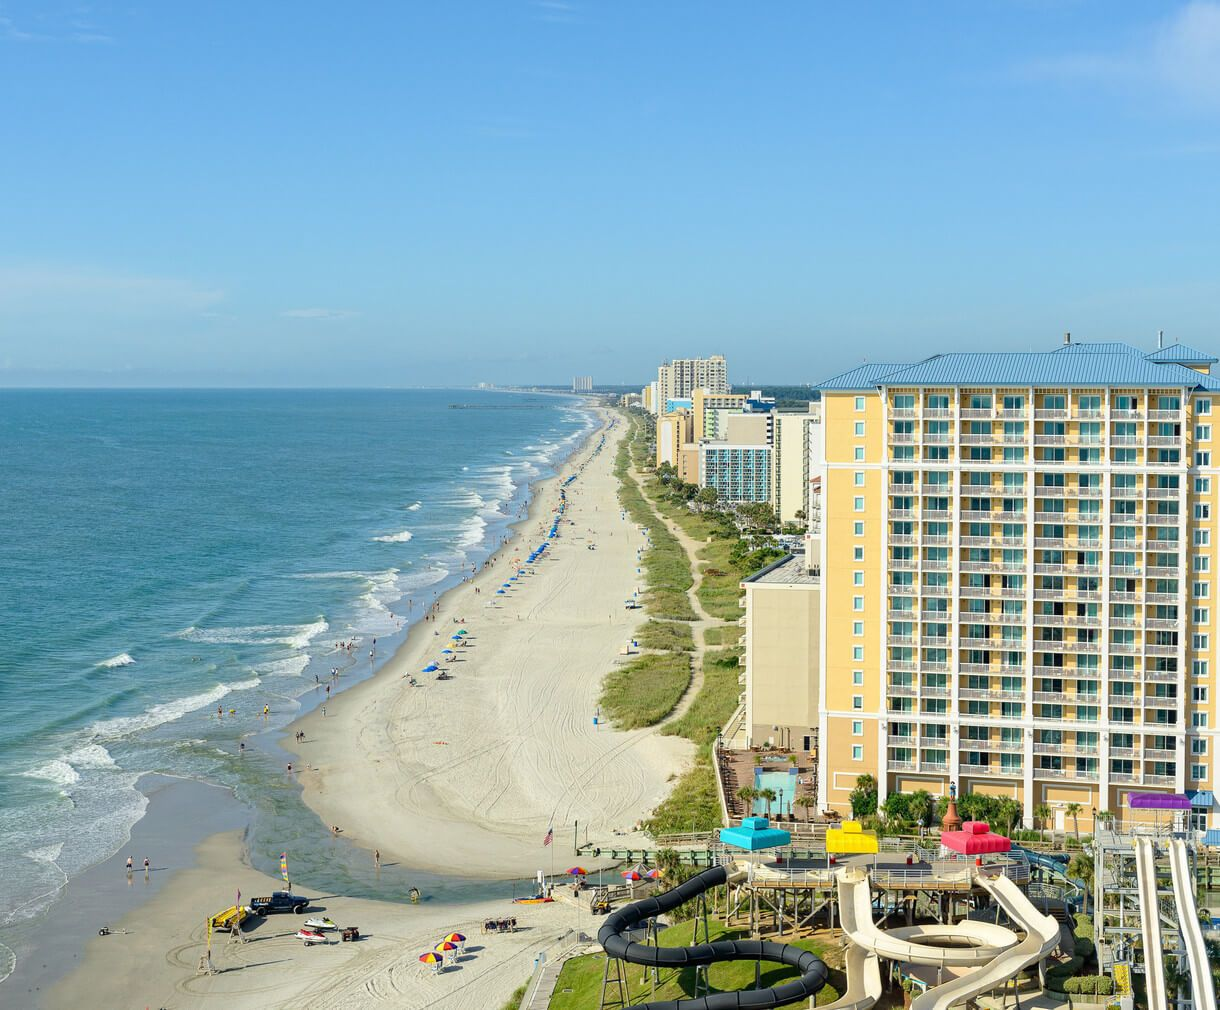 Beachfront resort adjacent to Family Kingdom Amusement